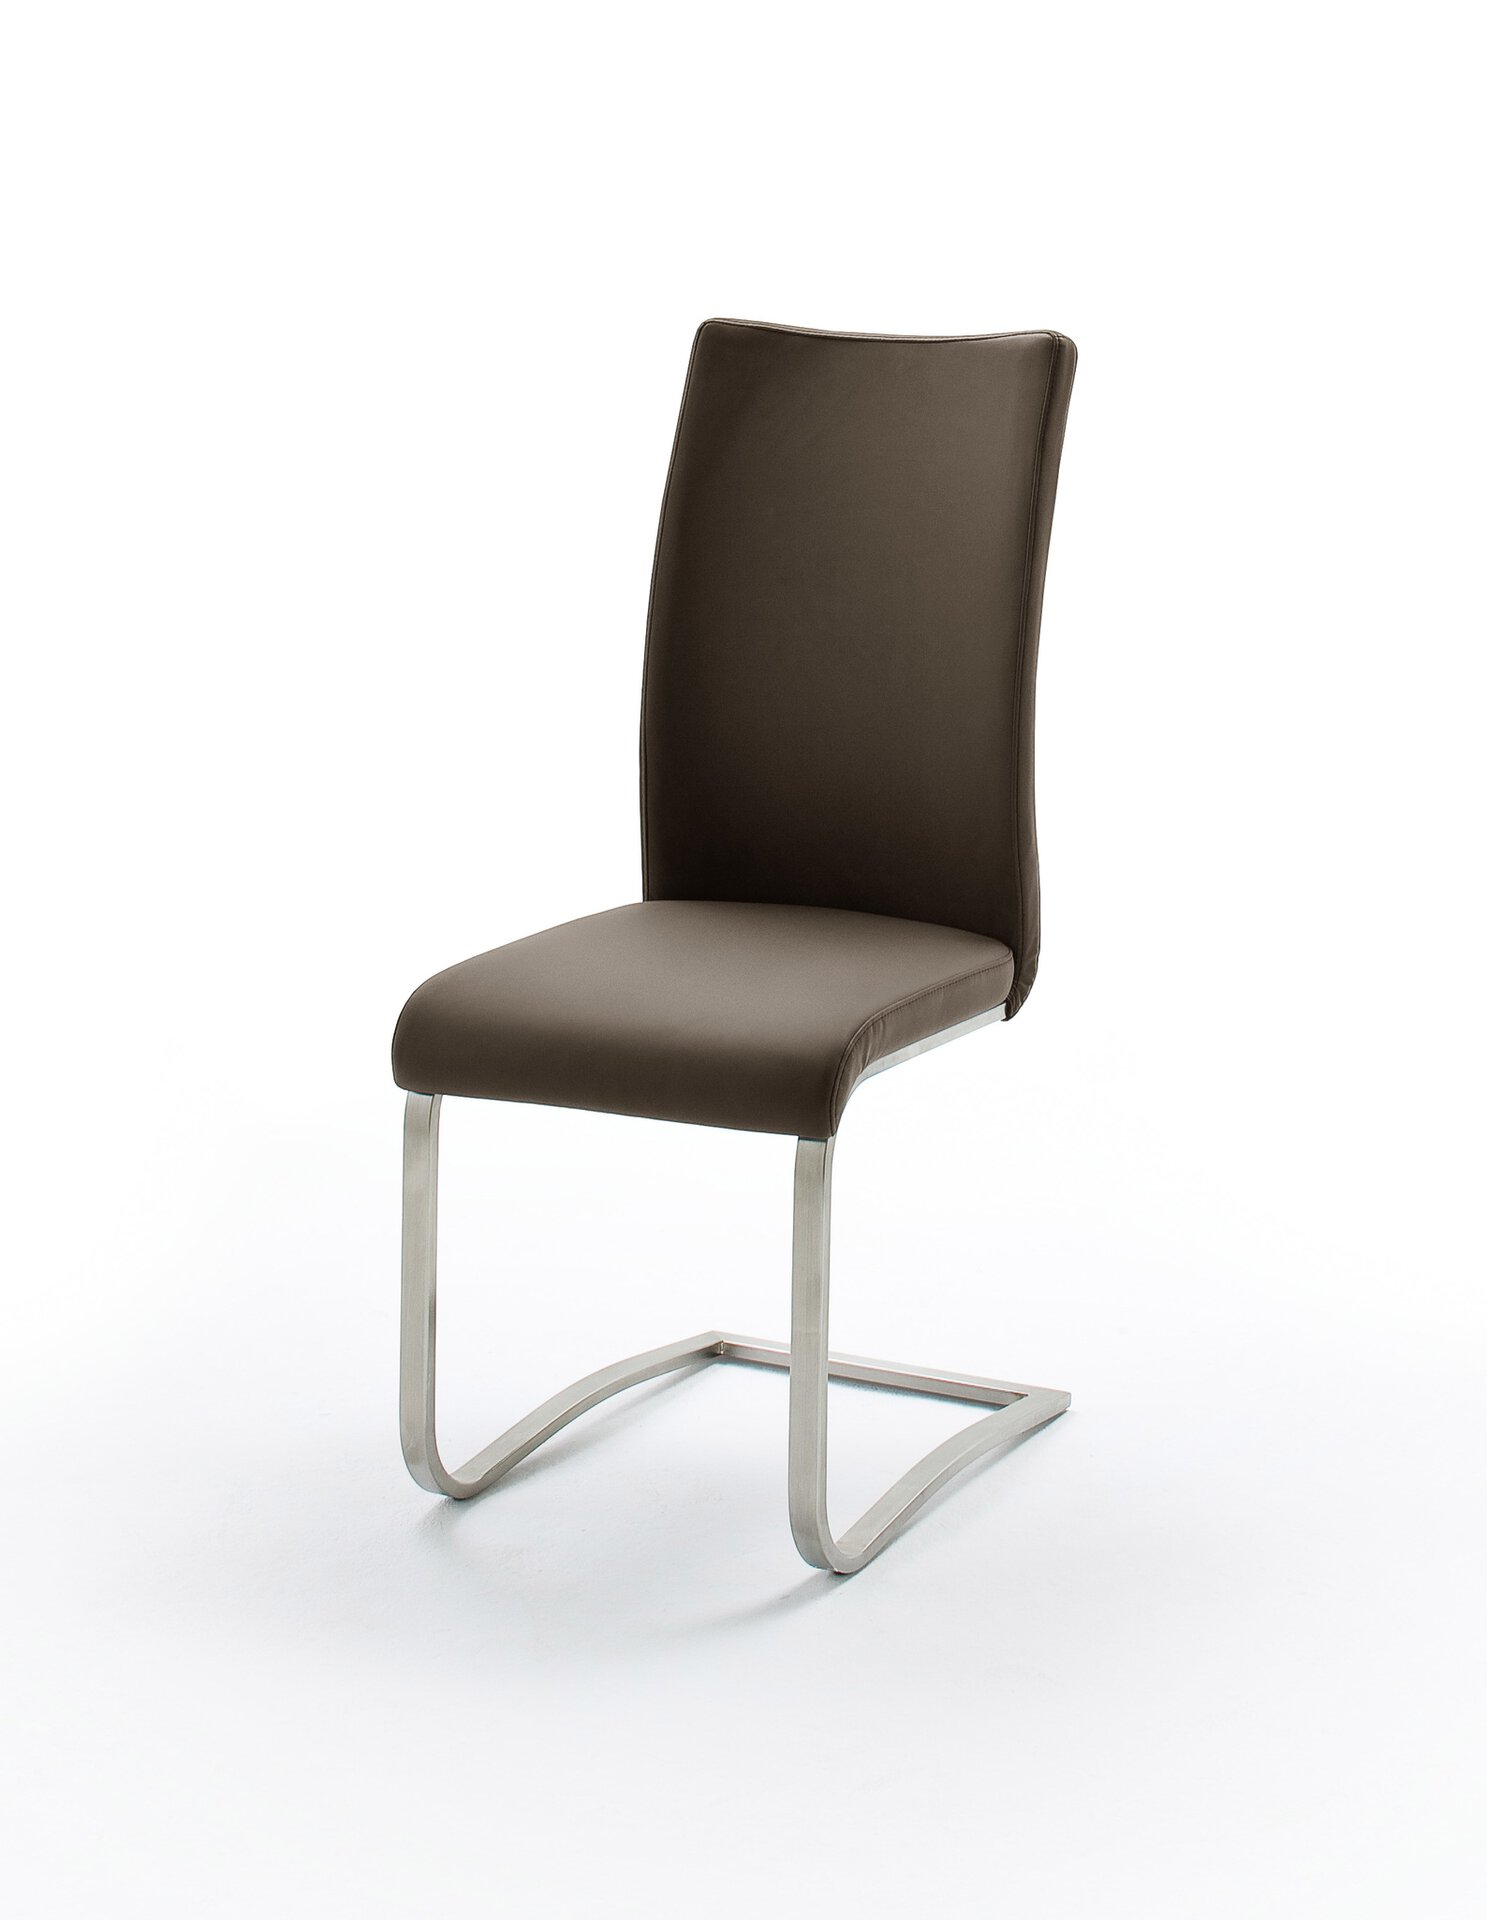 Freischwinger ARCO2 MCA furniture Metall mehrfarbig 52 x 103 x 43 cm